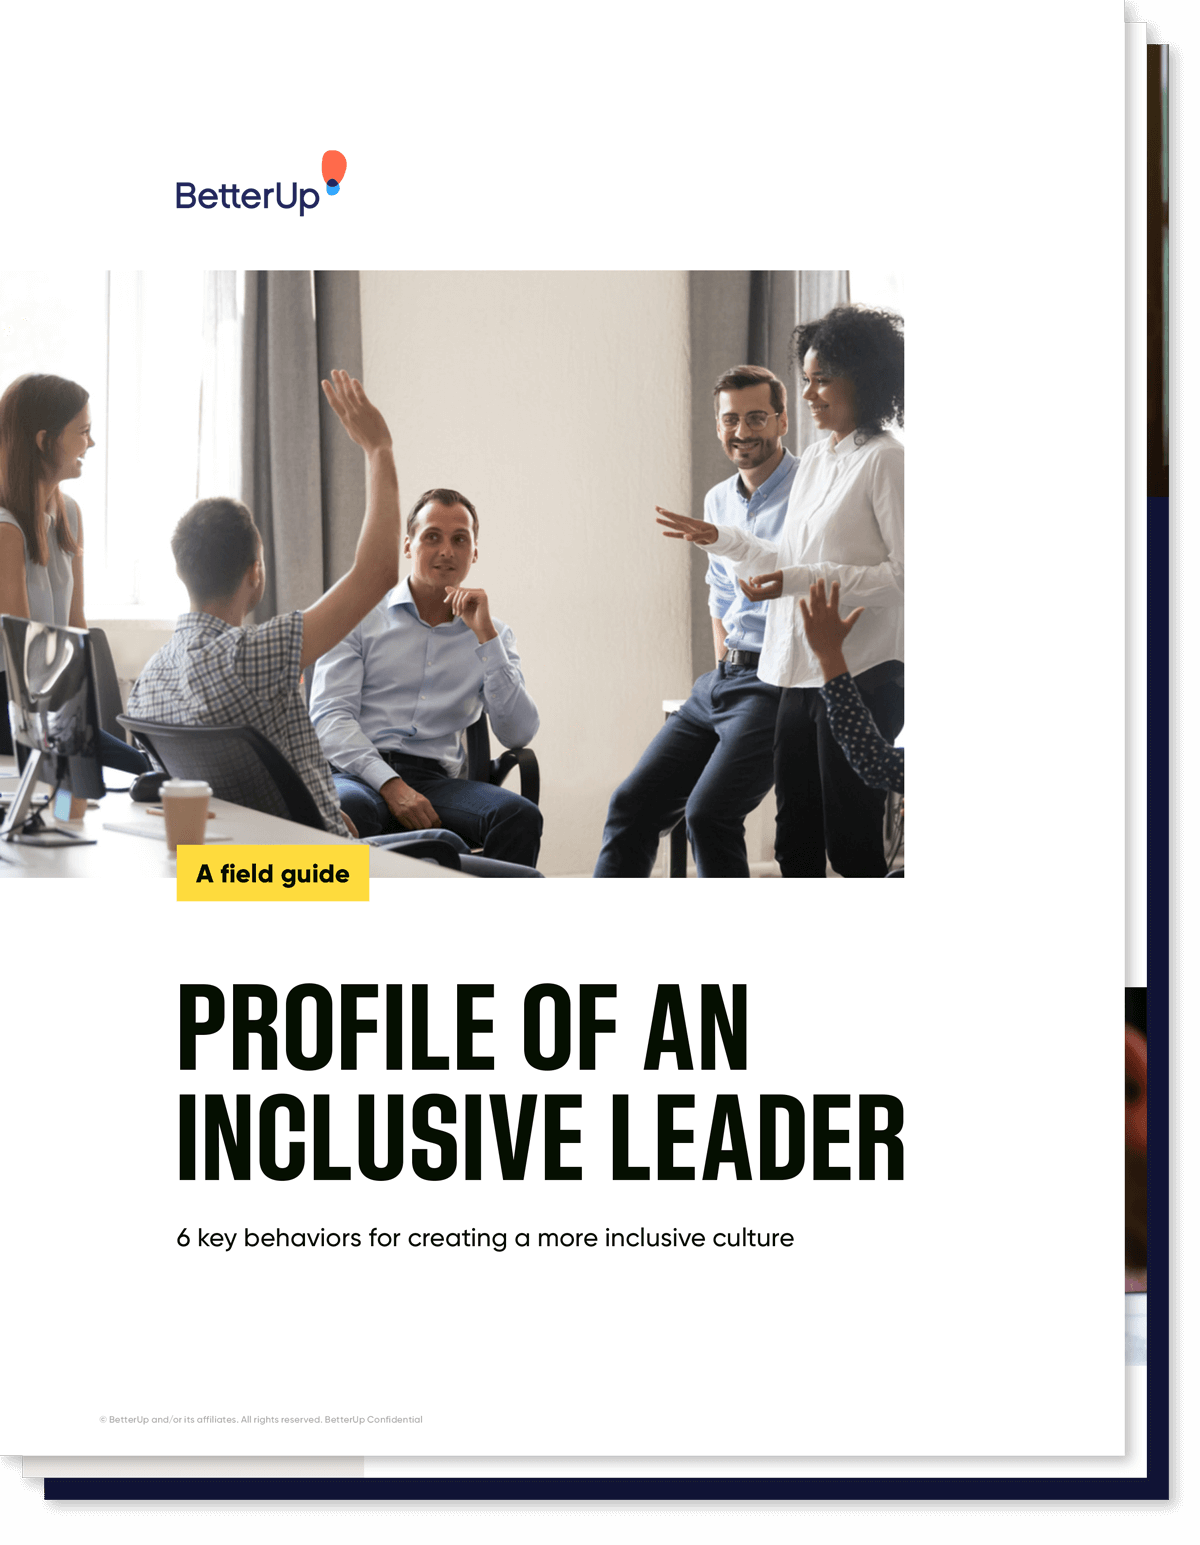 Profile of an inclusive